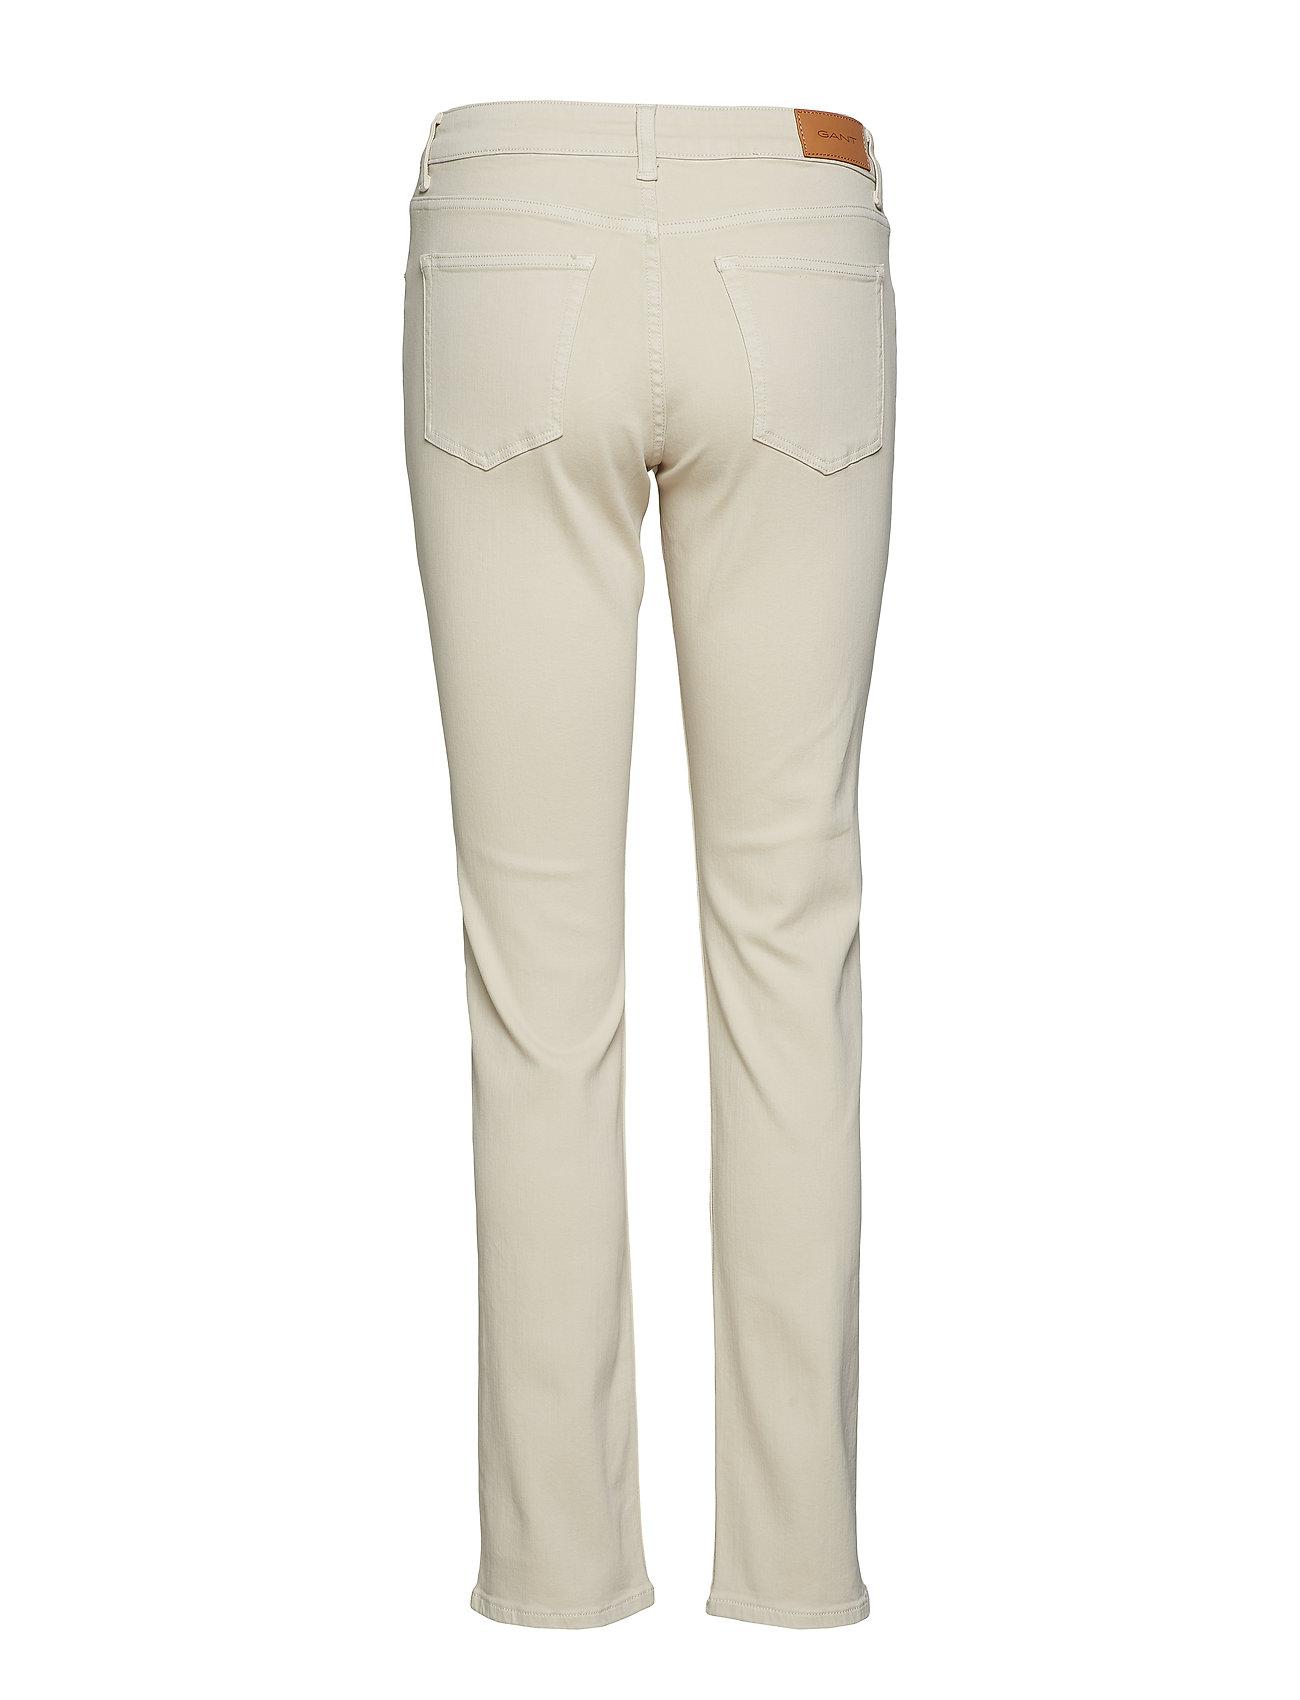 GANT - SLIM TWILL JEANS - slim jeans - putty - 1